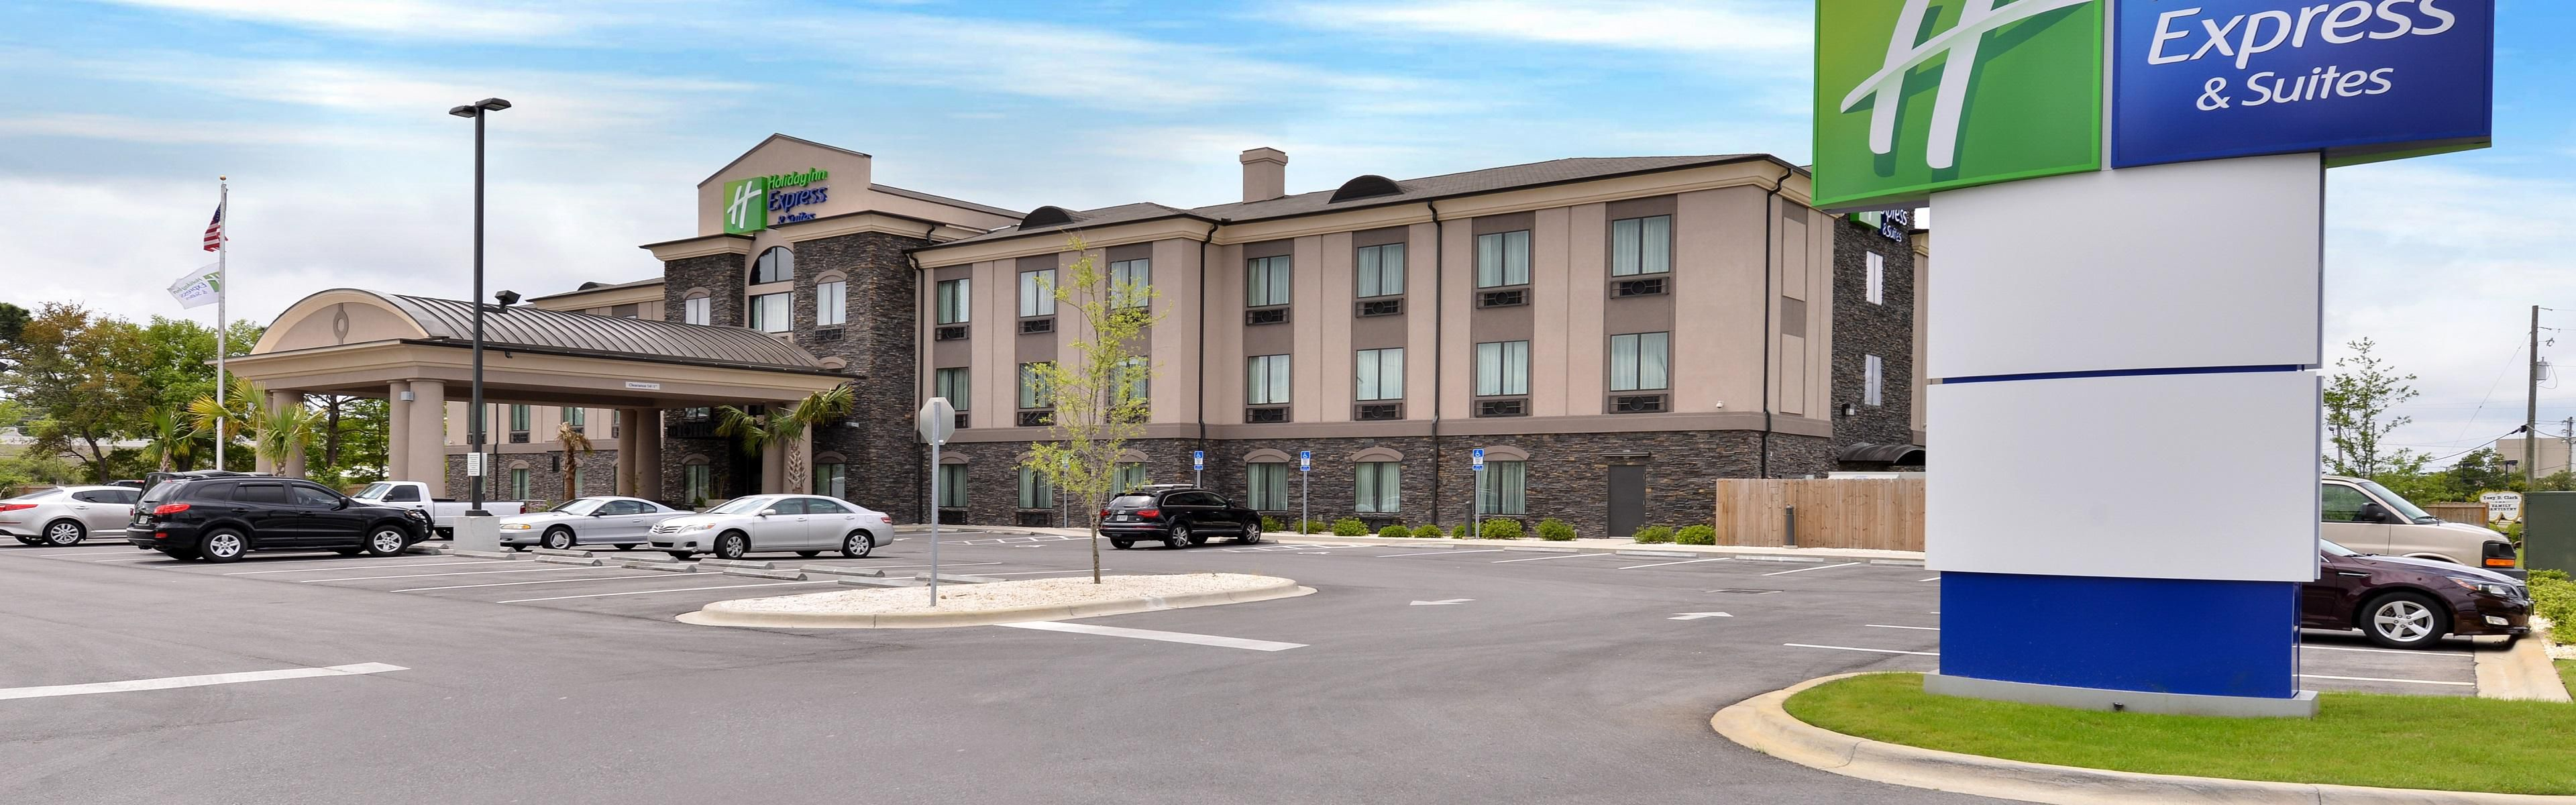 Holiday Inn Express & Suites Ft. Walton Bch - Hurlburt Area image 0